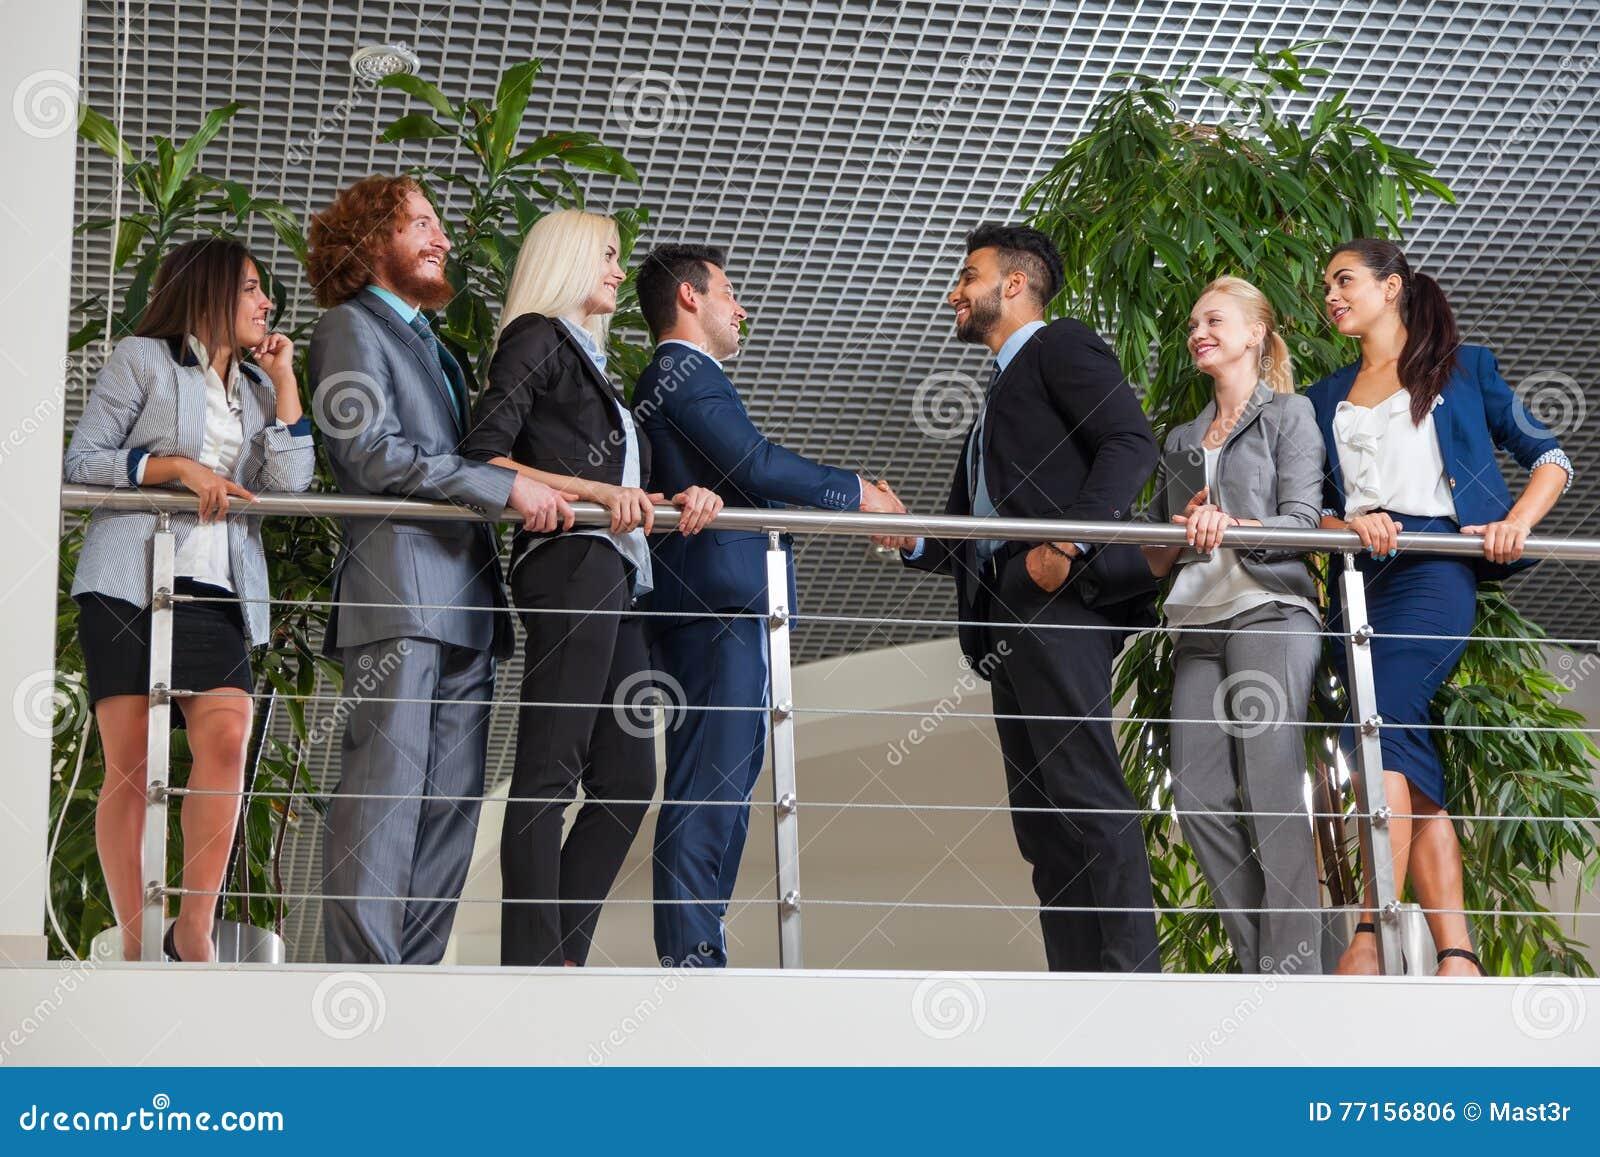 Business People Group Boss Hand Shake Welcome Gesture In Modern Office, Businesspeople Team Handshake